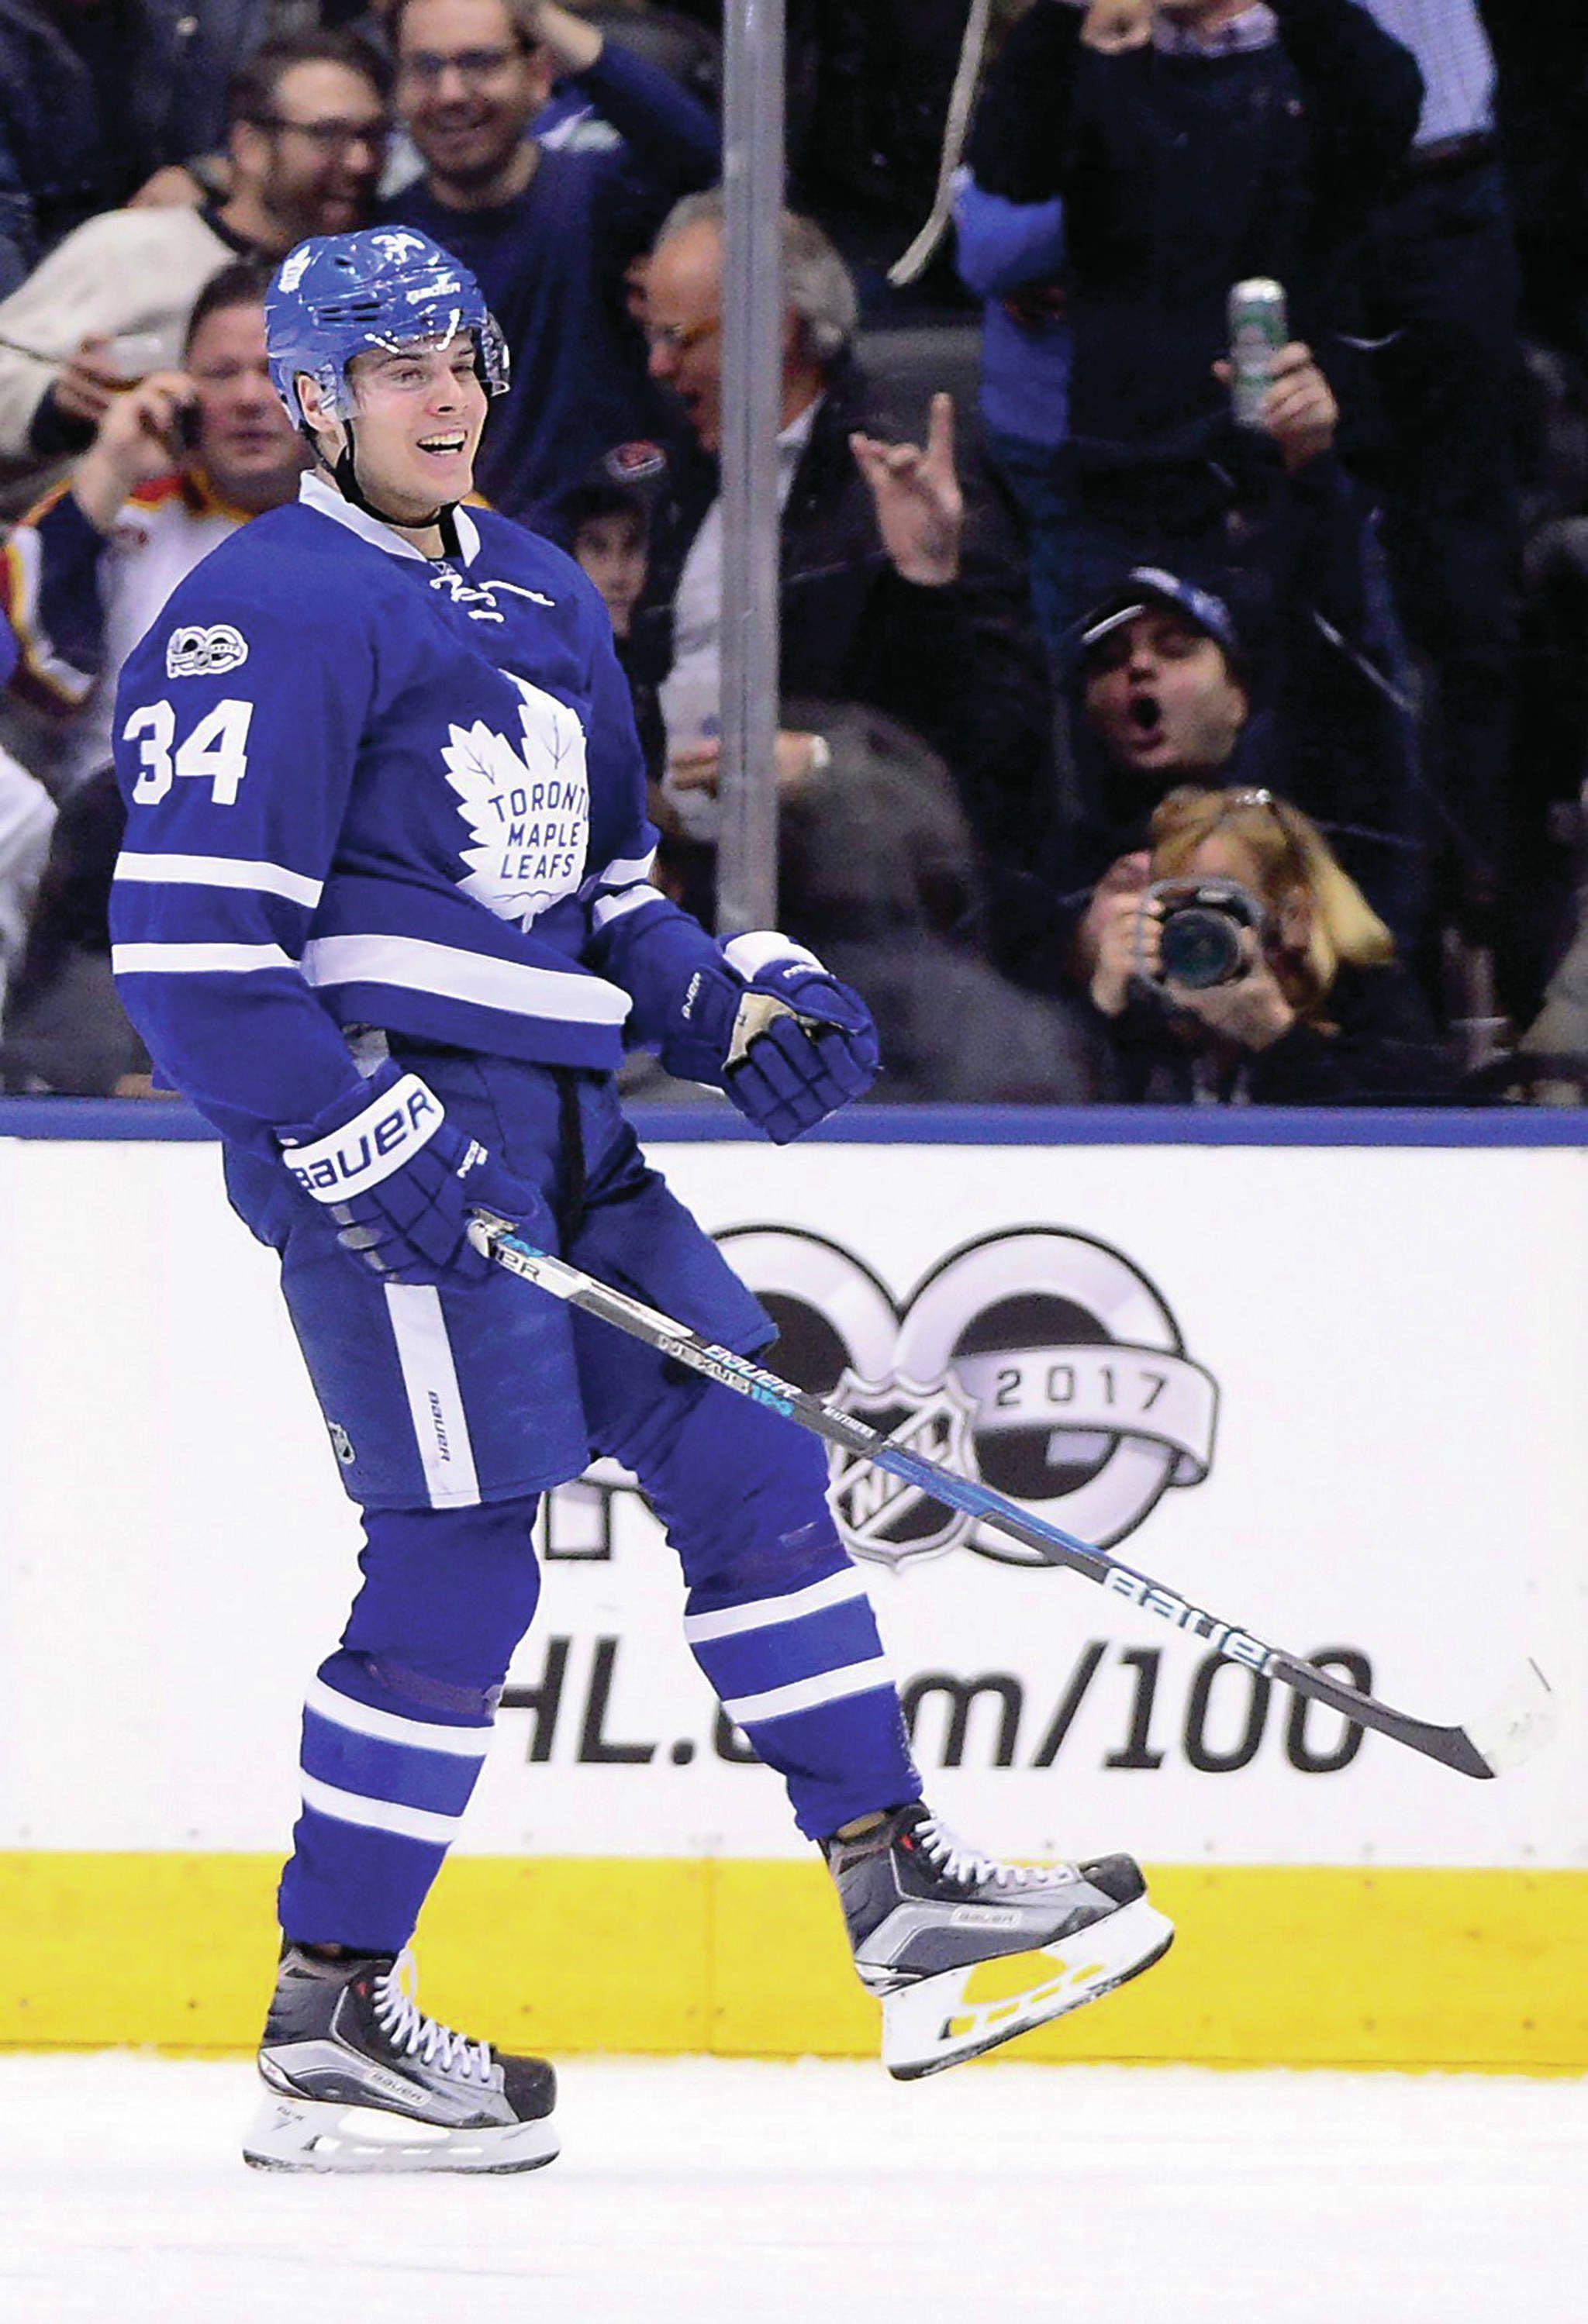 Auston Matthews Toronto Maple Leafs Toronto Maple Leafs Hockey Toronto Maple Leafs Maple Leafs Hockey